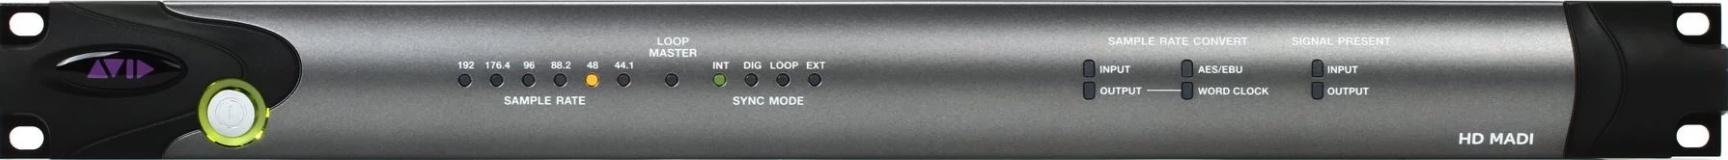 Avid Legacy I/O Trade-in Upgrade to HD I/O MADI